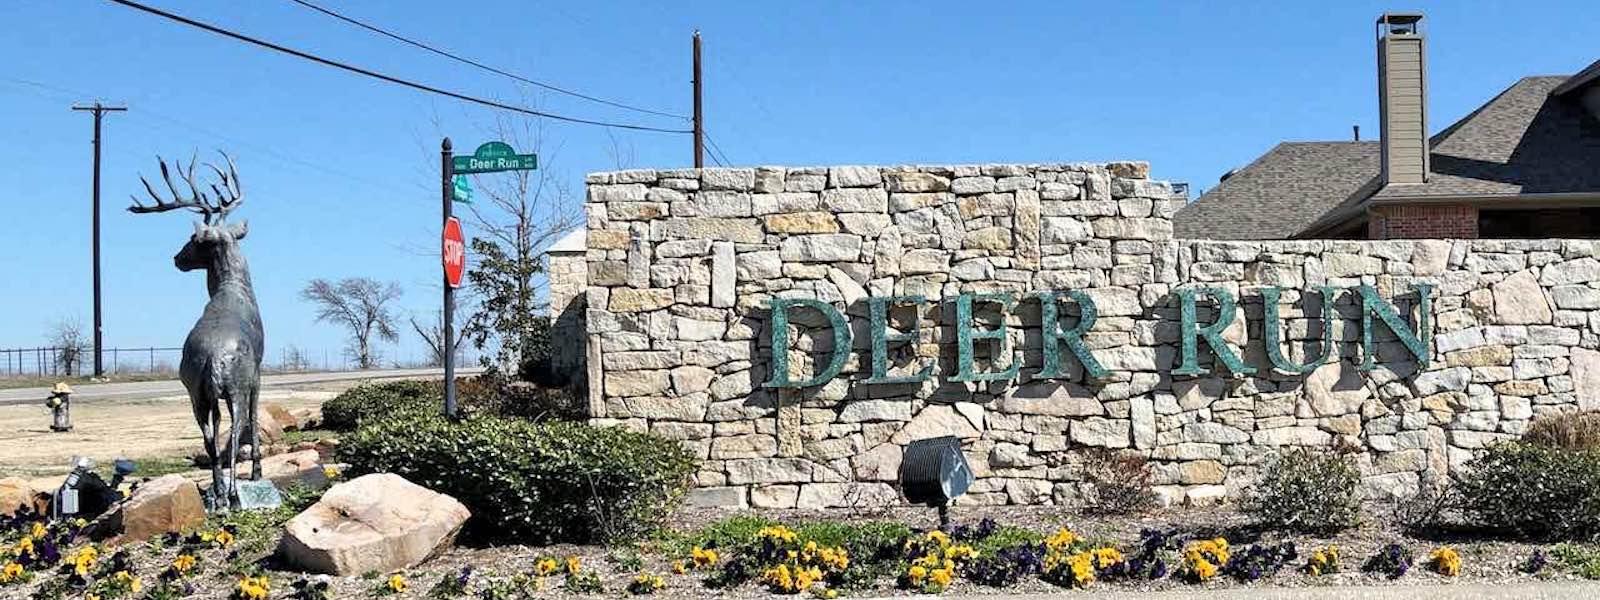 The entrance to deer run in prosper tx